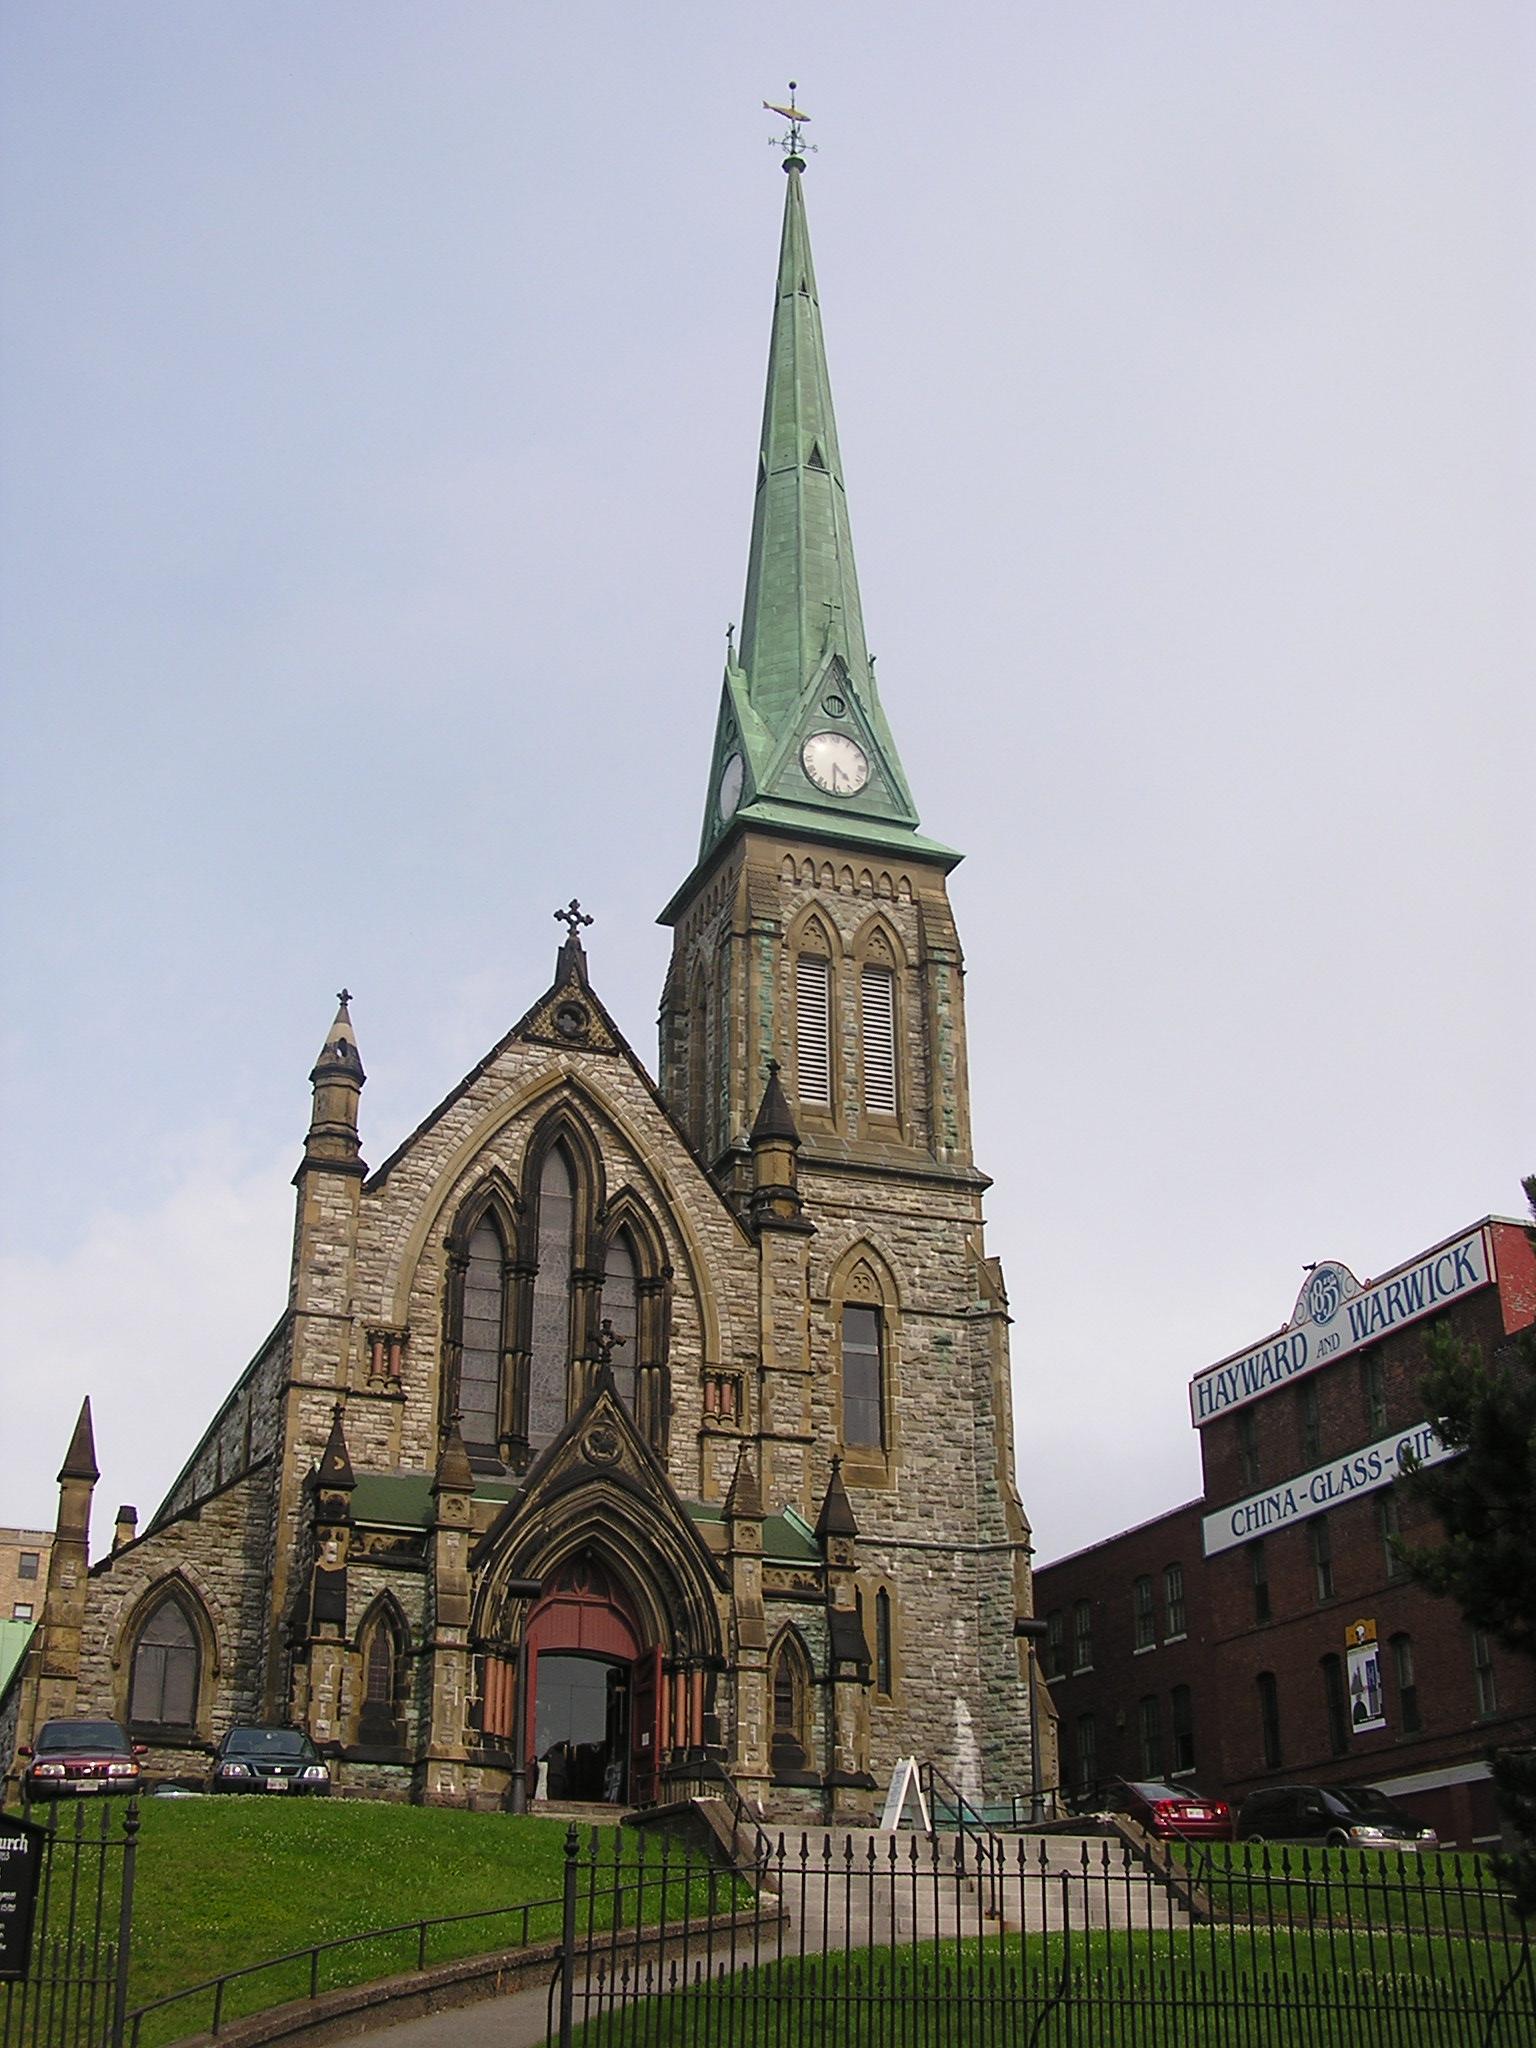 saint johns hindu dating site The parish of saint john was formed in 1836[2] ivybridge became a civil parish in 1894 and that was on the site of saint john's saint johns church.